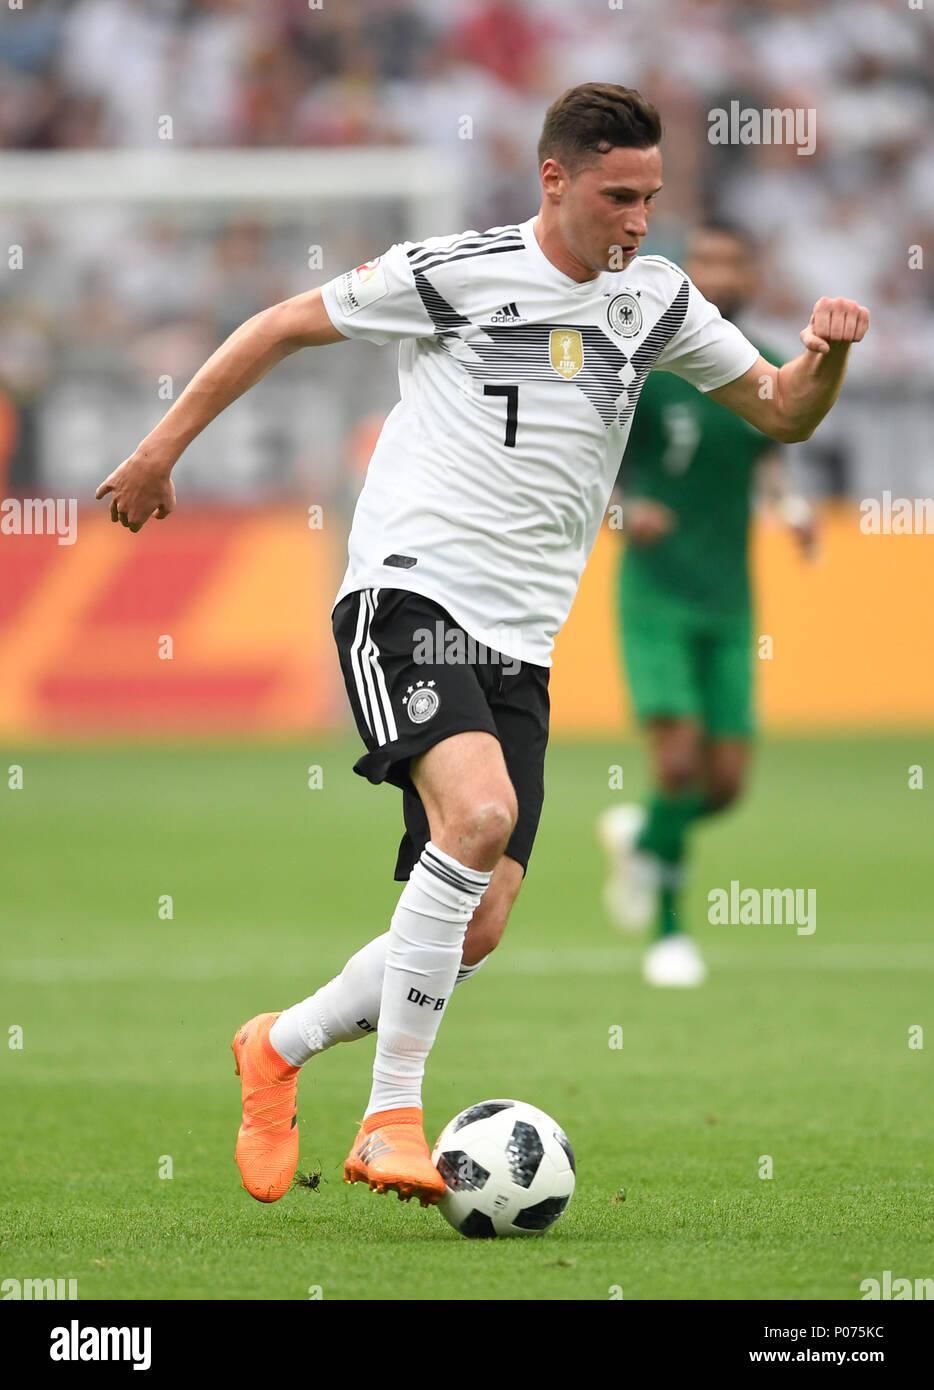 08 June 2018, Germany, Leverkusen: Soccer, international, Germany vs Saudi Arabia at the BayArena. Germany's Julian Draxler. Photo: Marius Becker/dpa Stock Photo